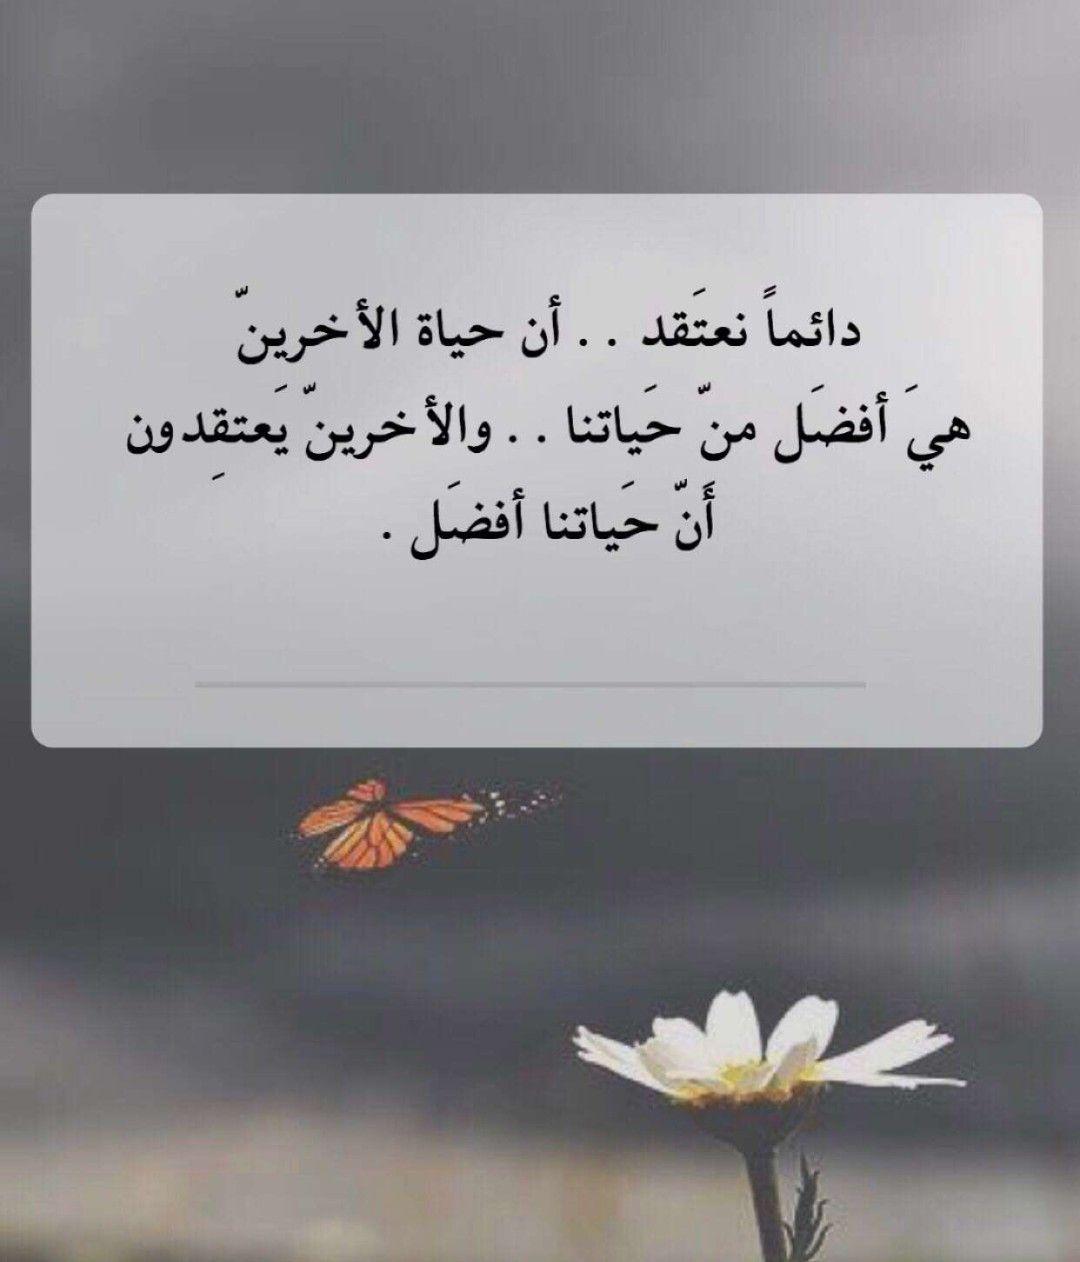 وماحد اقتنع ولاصدق Photo Quotes Holy Quran Arabic Words